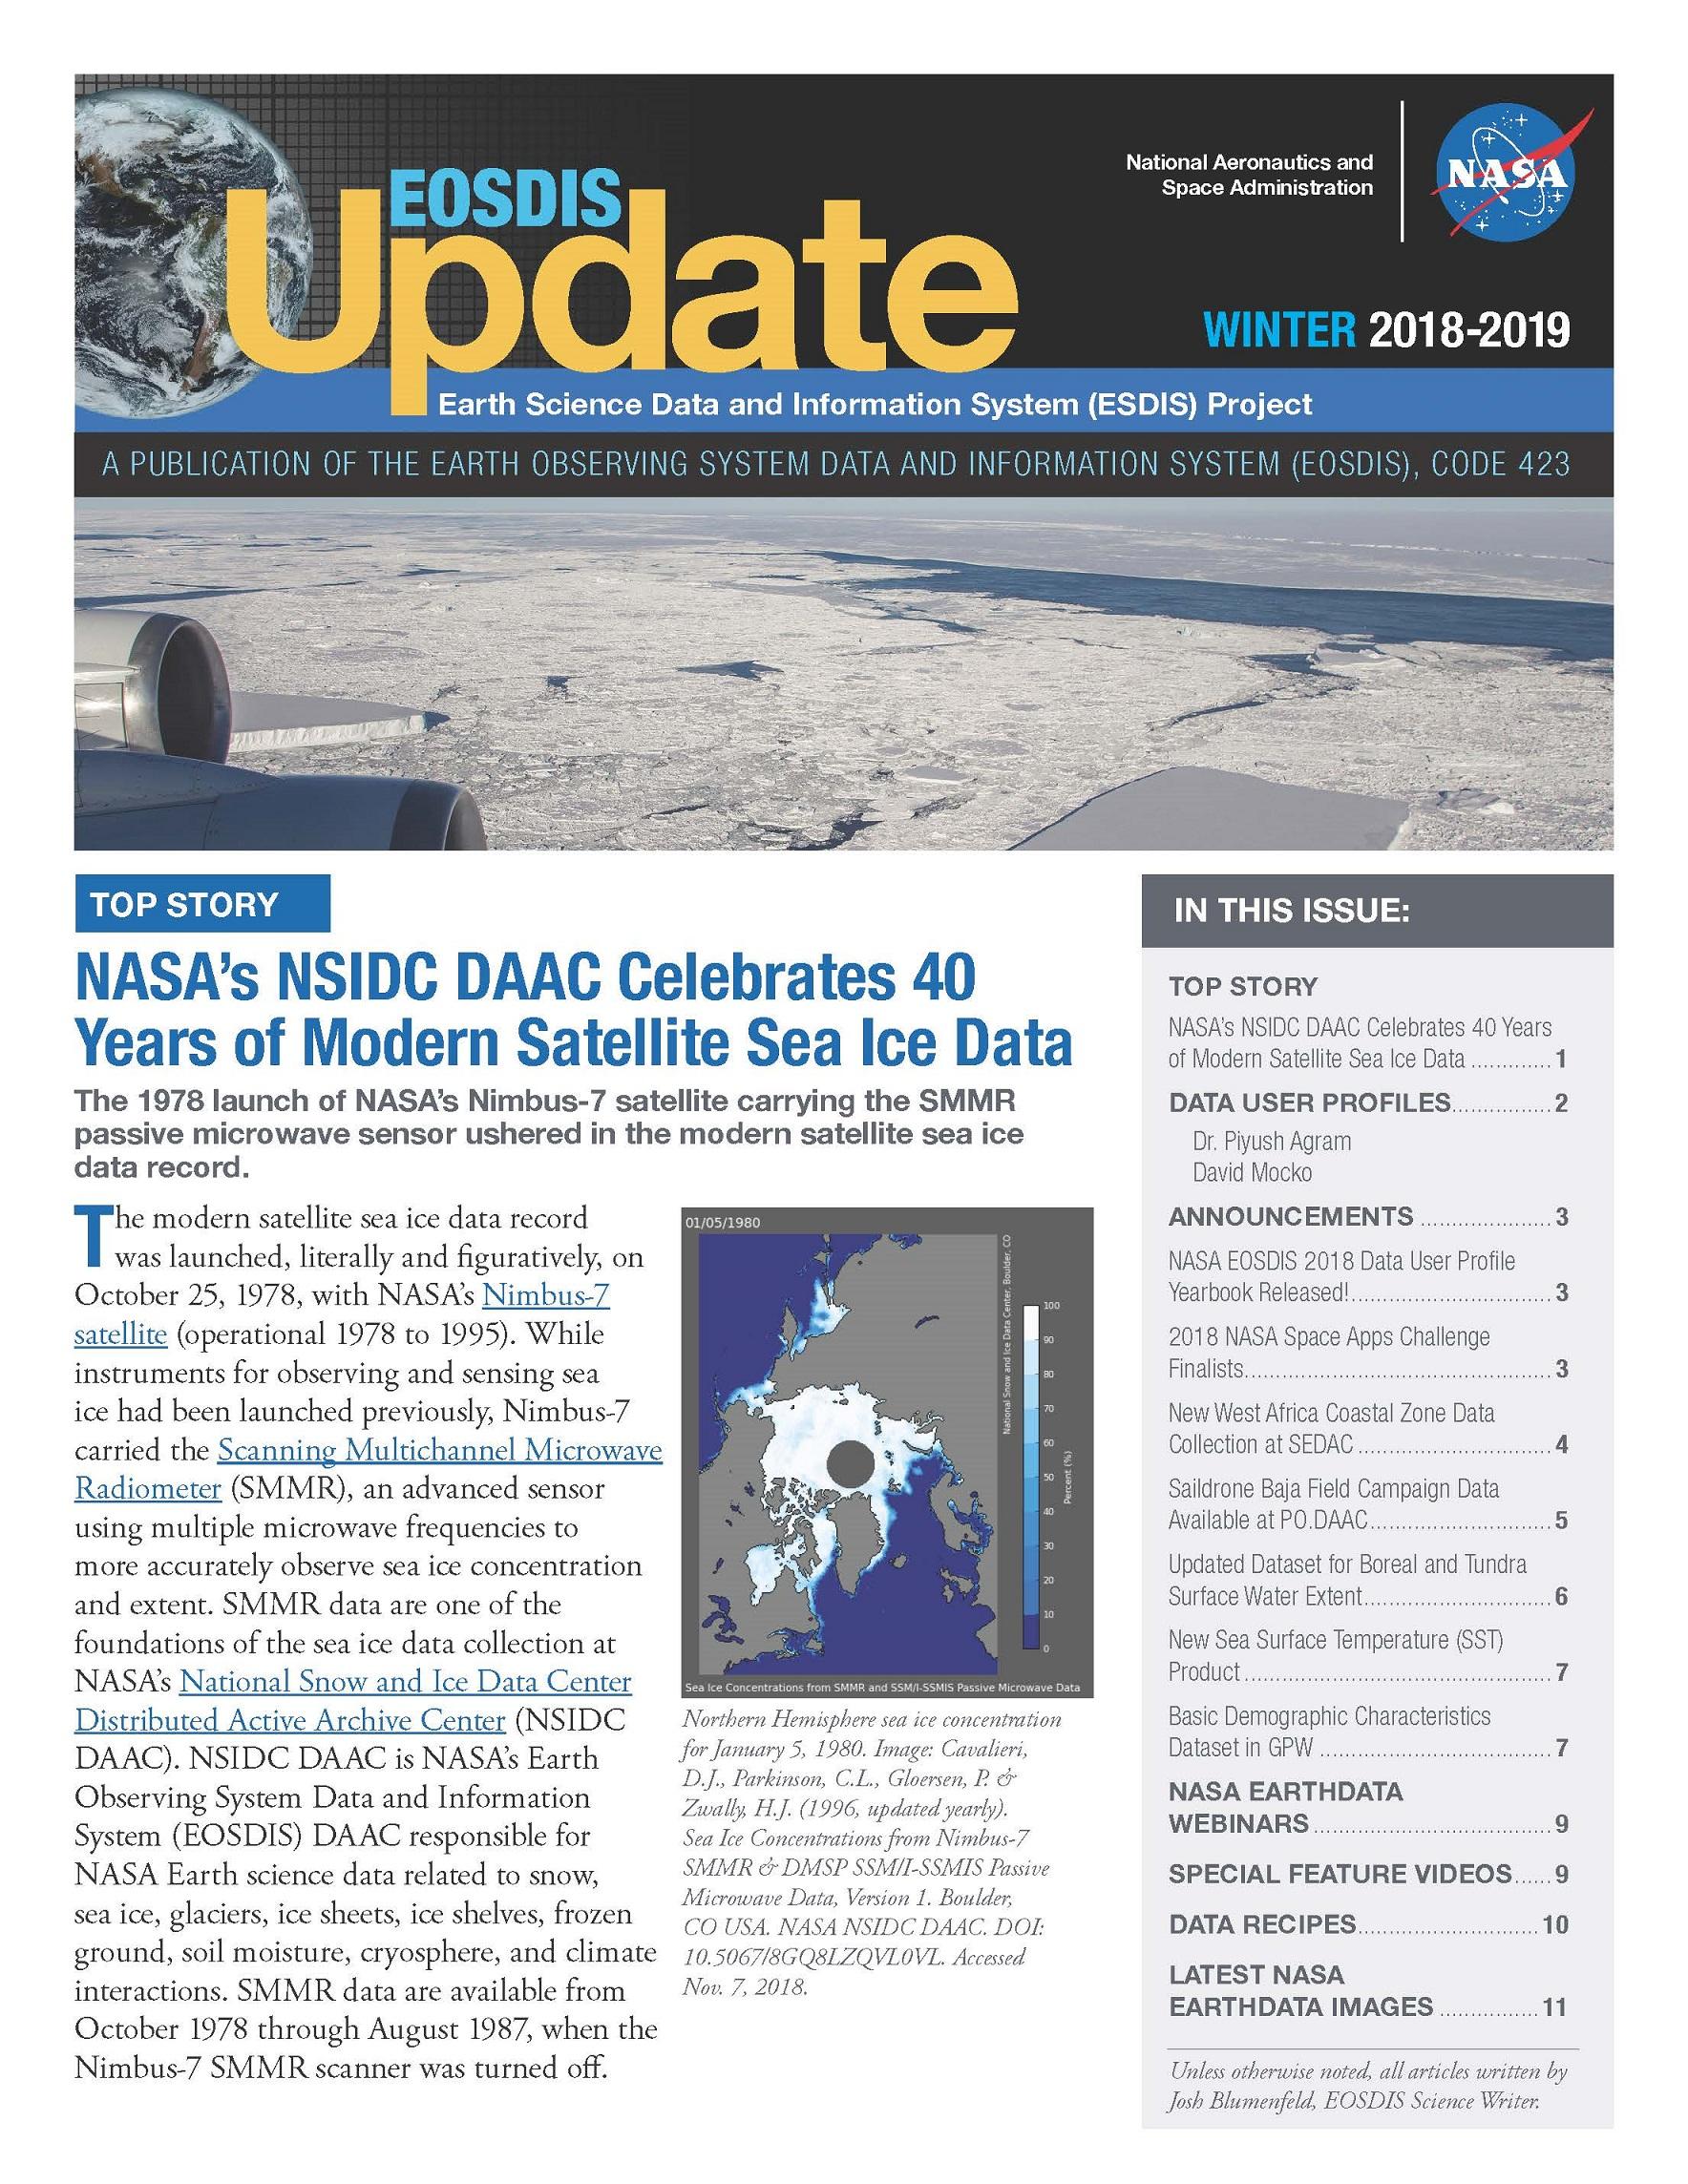 Cover- EOSDIS Update Winter 2018/2019 Image